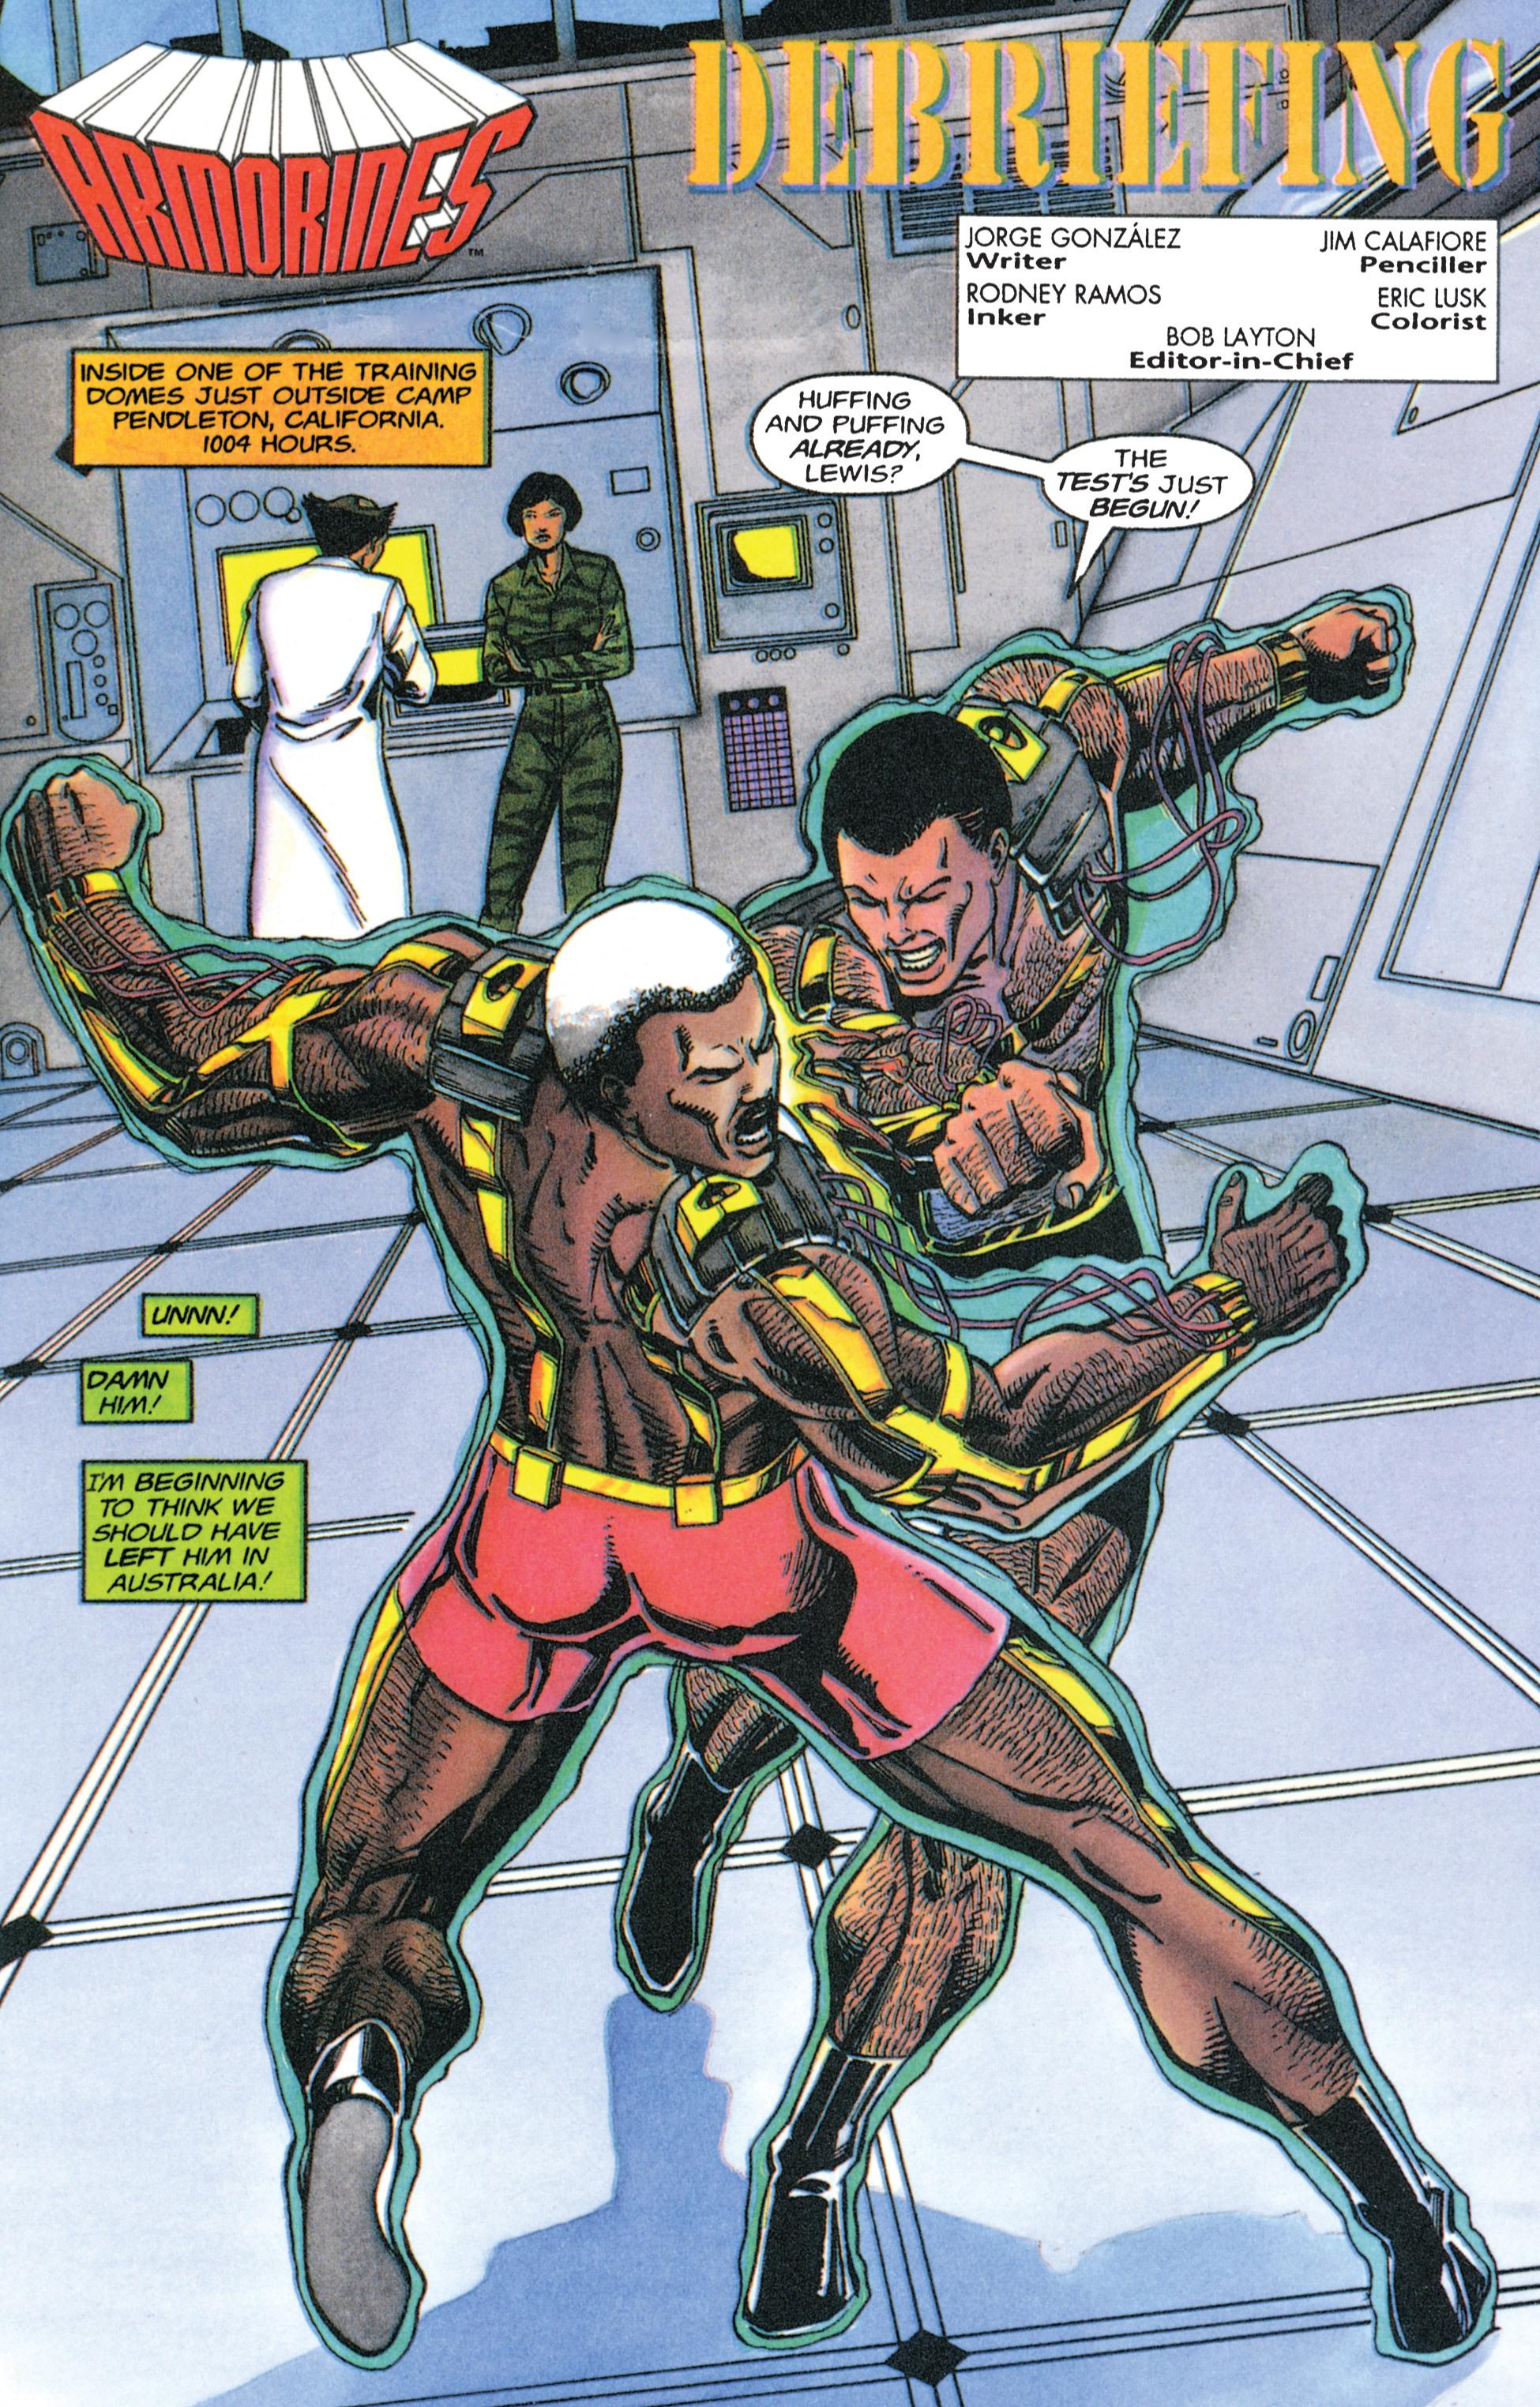 Read online Armorines comic -  Issue #4 - 2